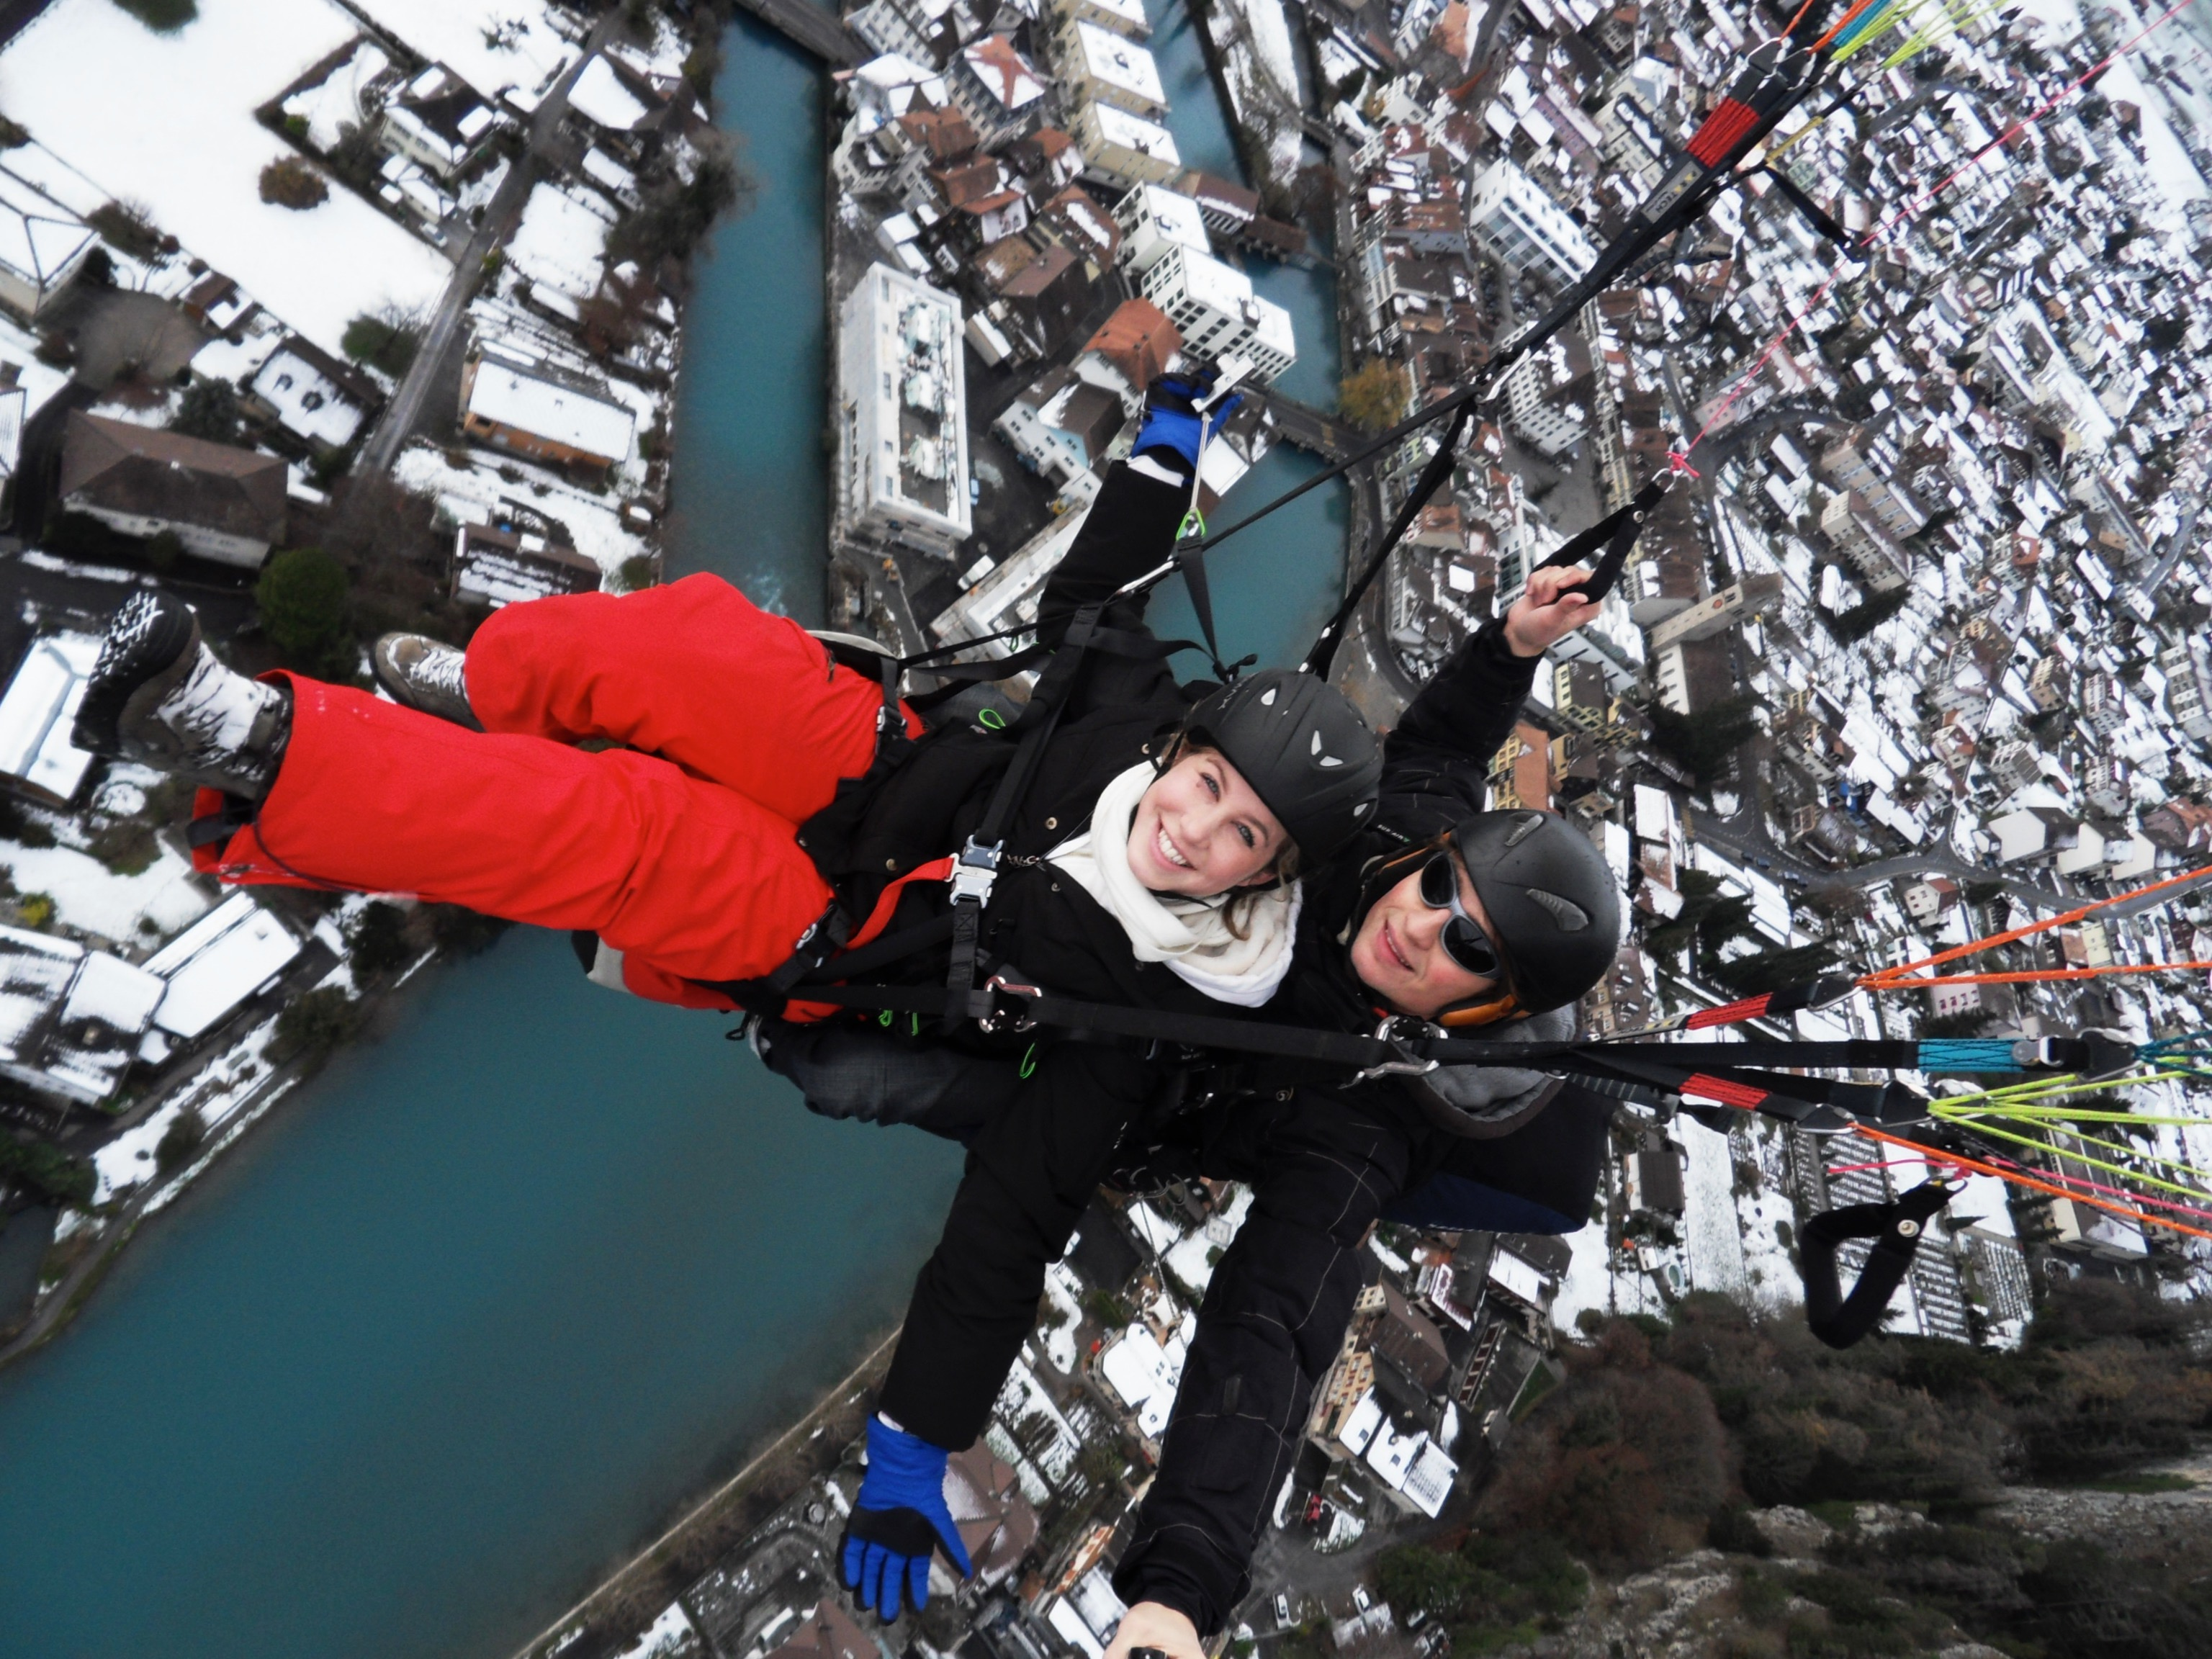 Paragliding Europe Spontaneous Travel to Interlaken, Switzerland